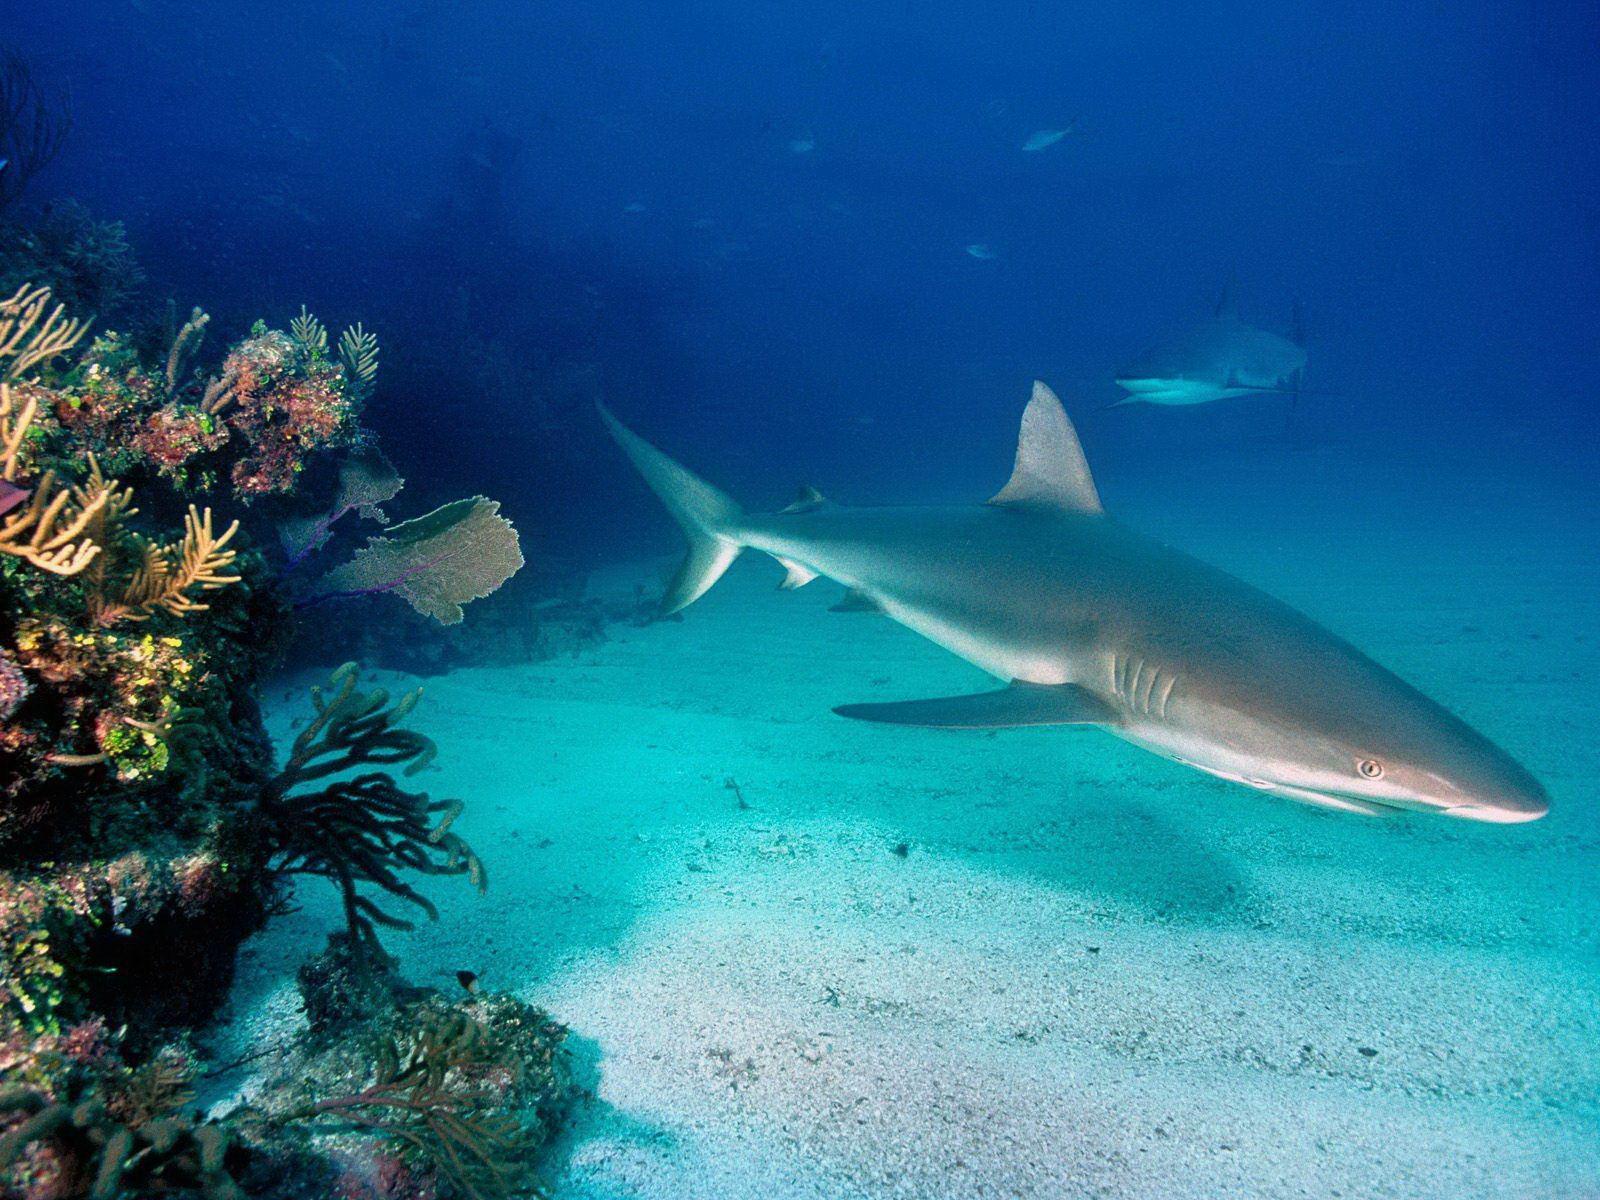 R Fisheries Fish R: Shark Fish